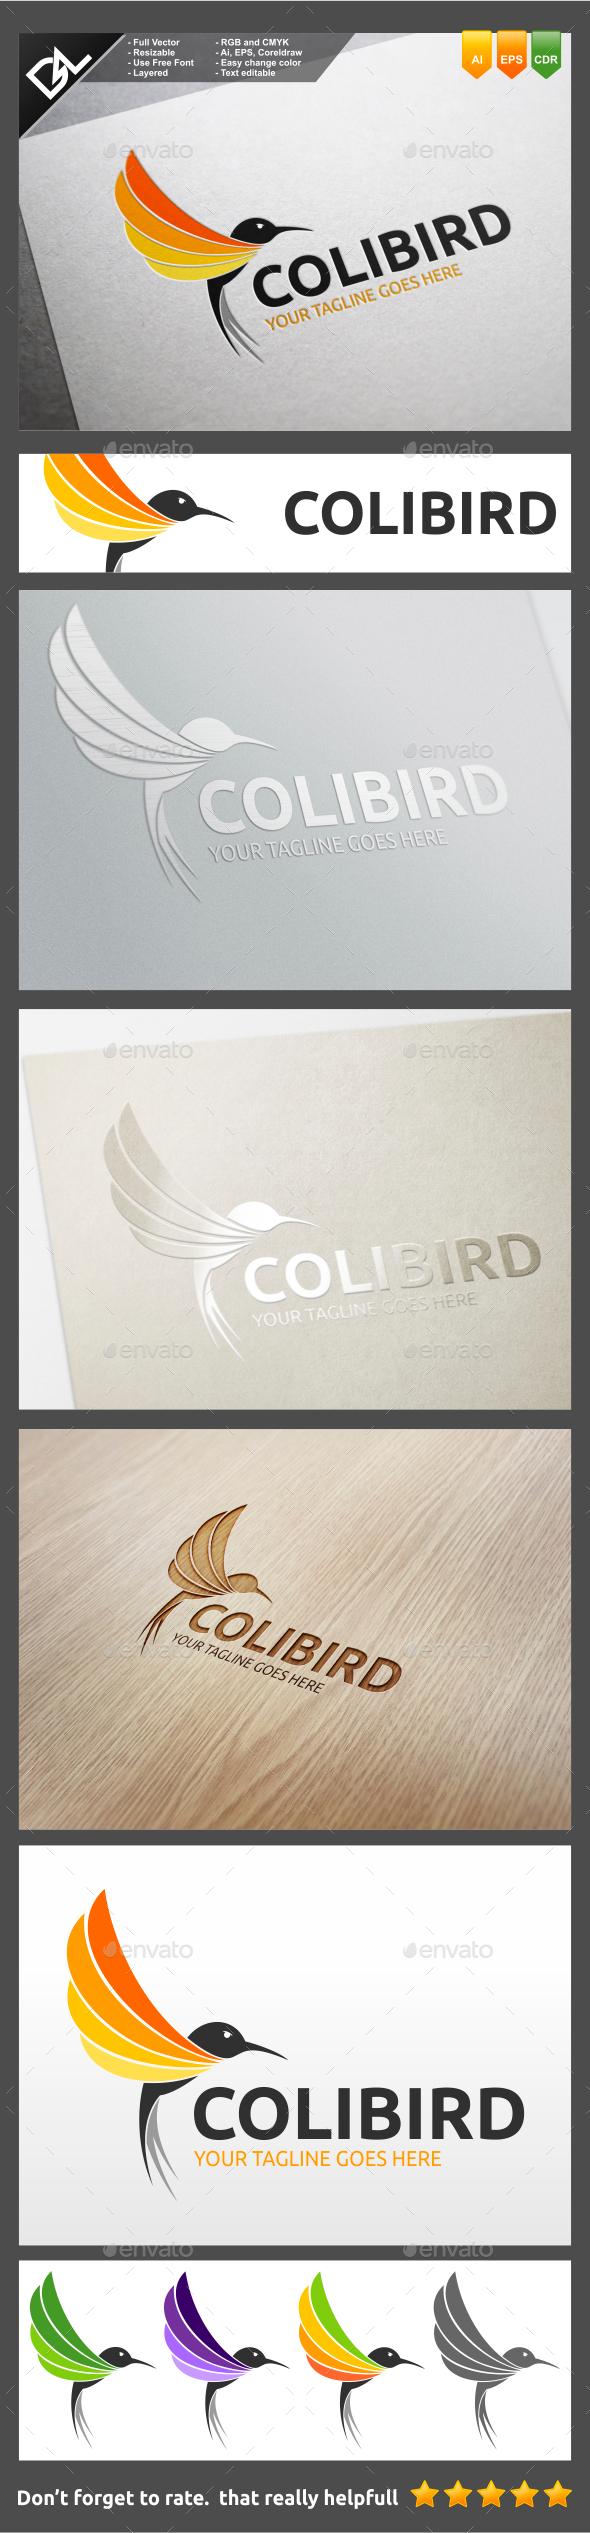 GraphicRiver Colibird 10793492